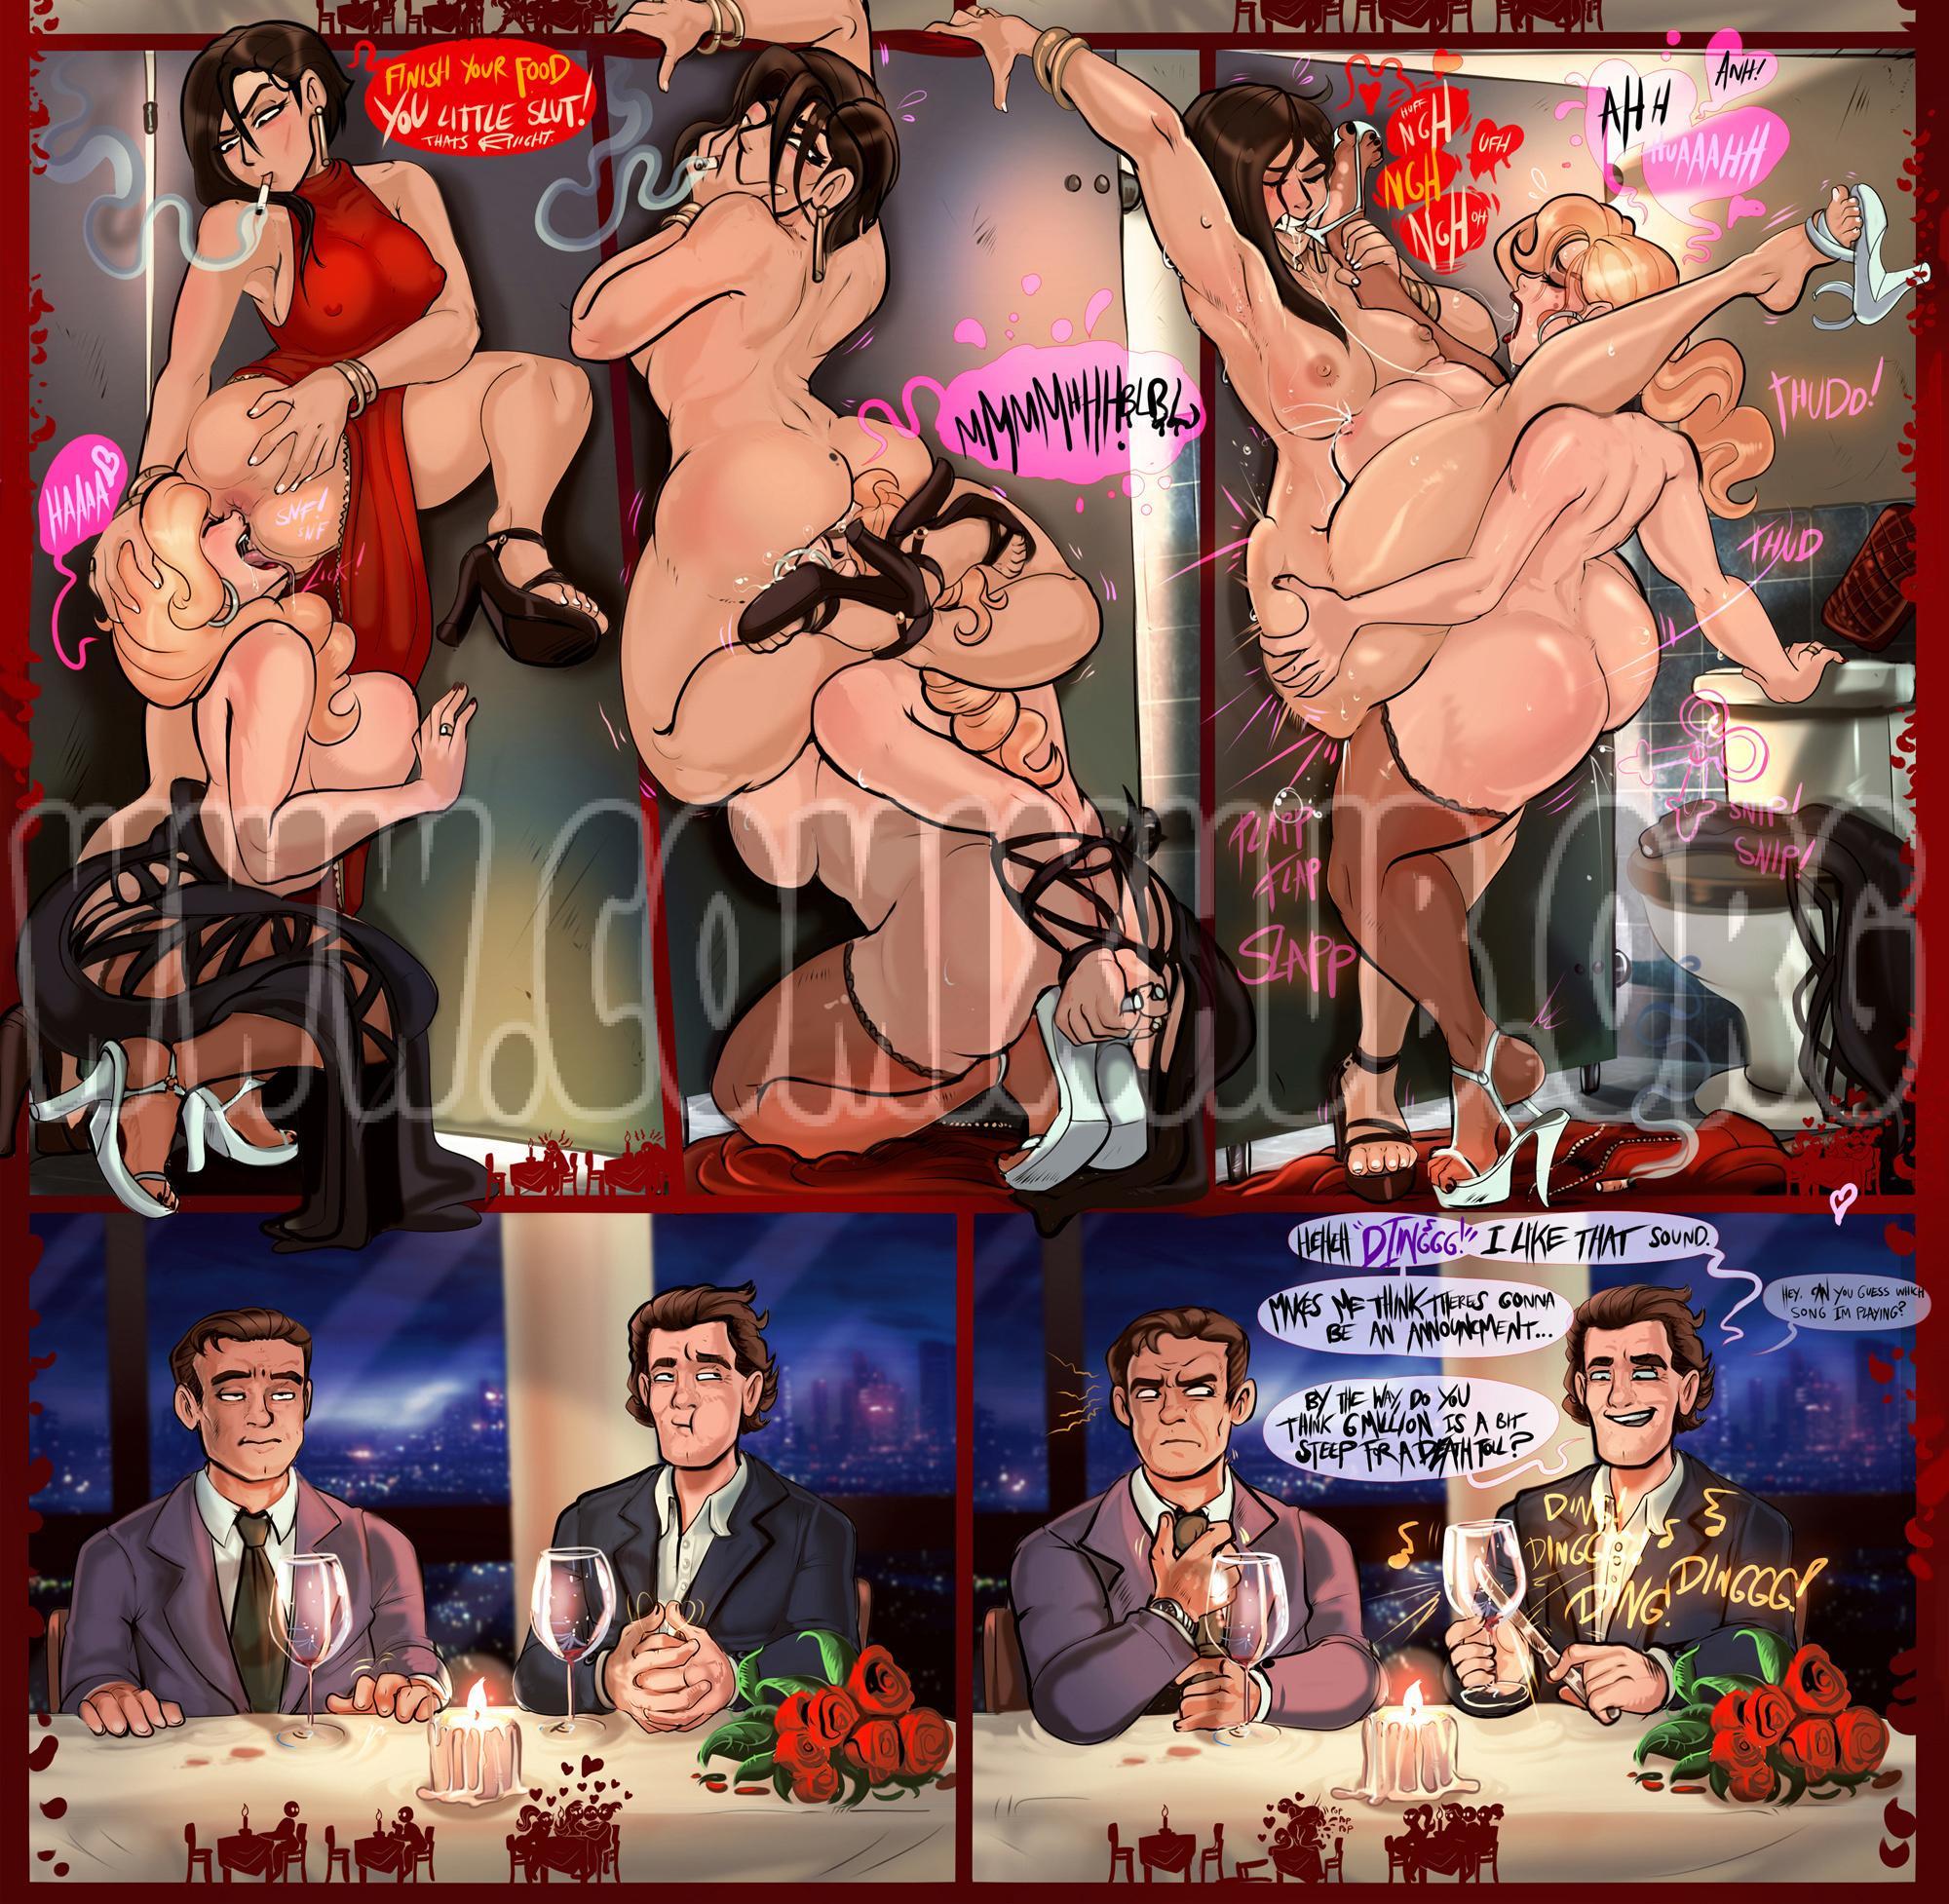 Datenight porn comics Oral sex, cunnilingus, Lesbians